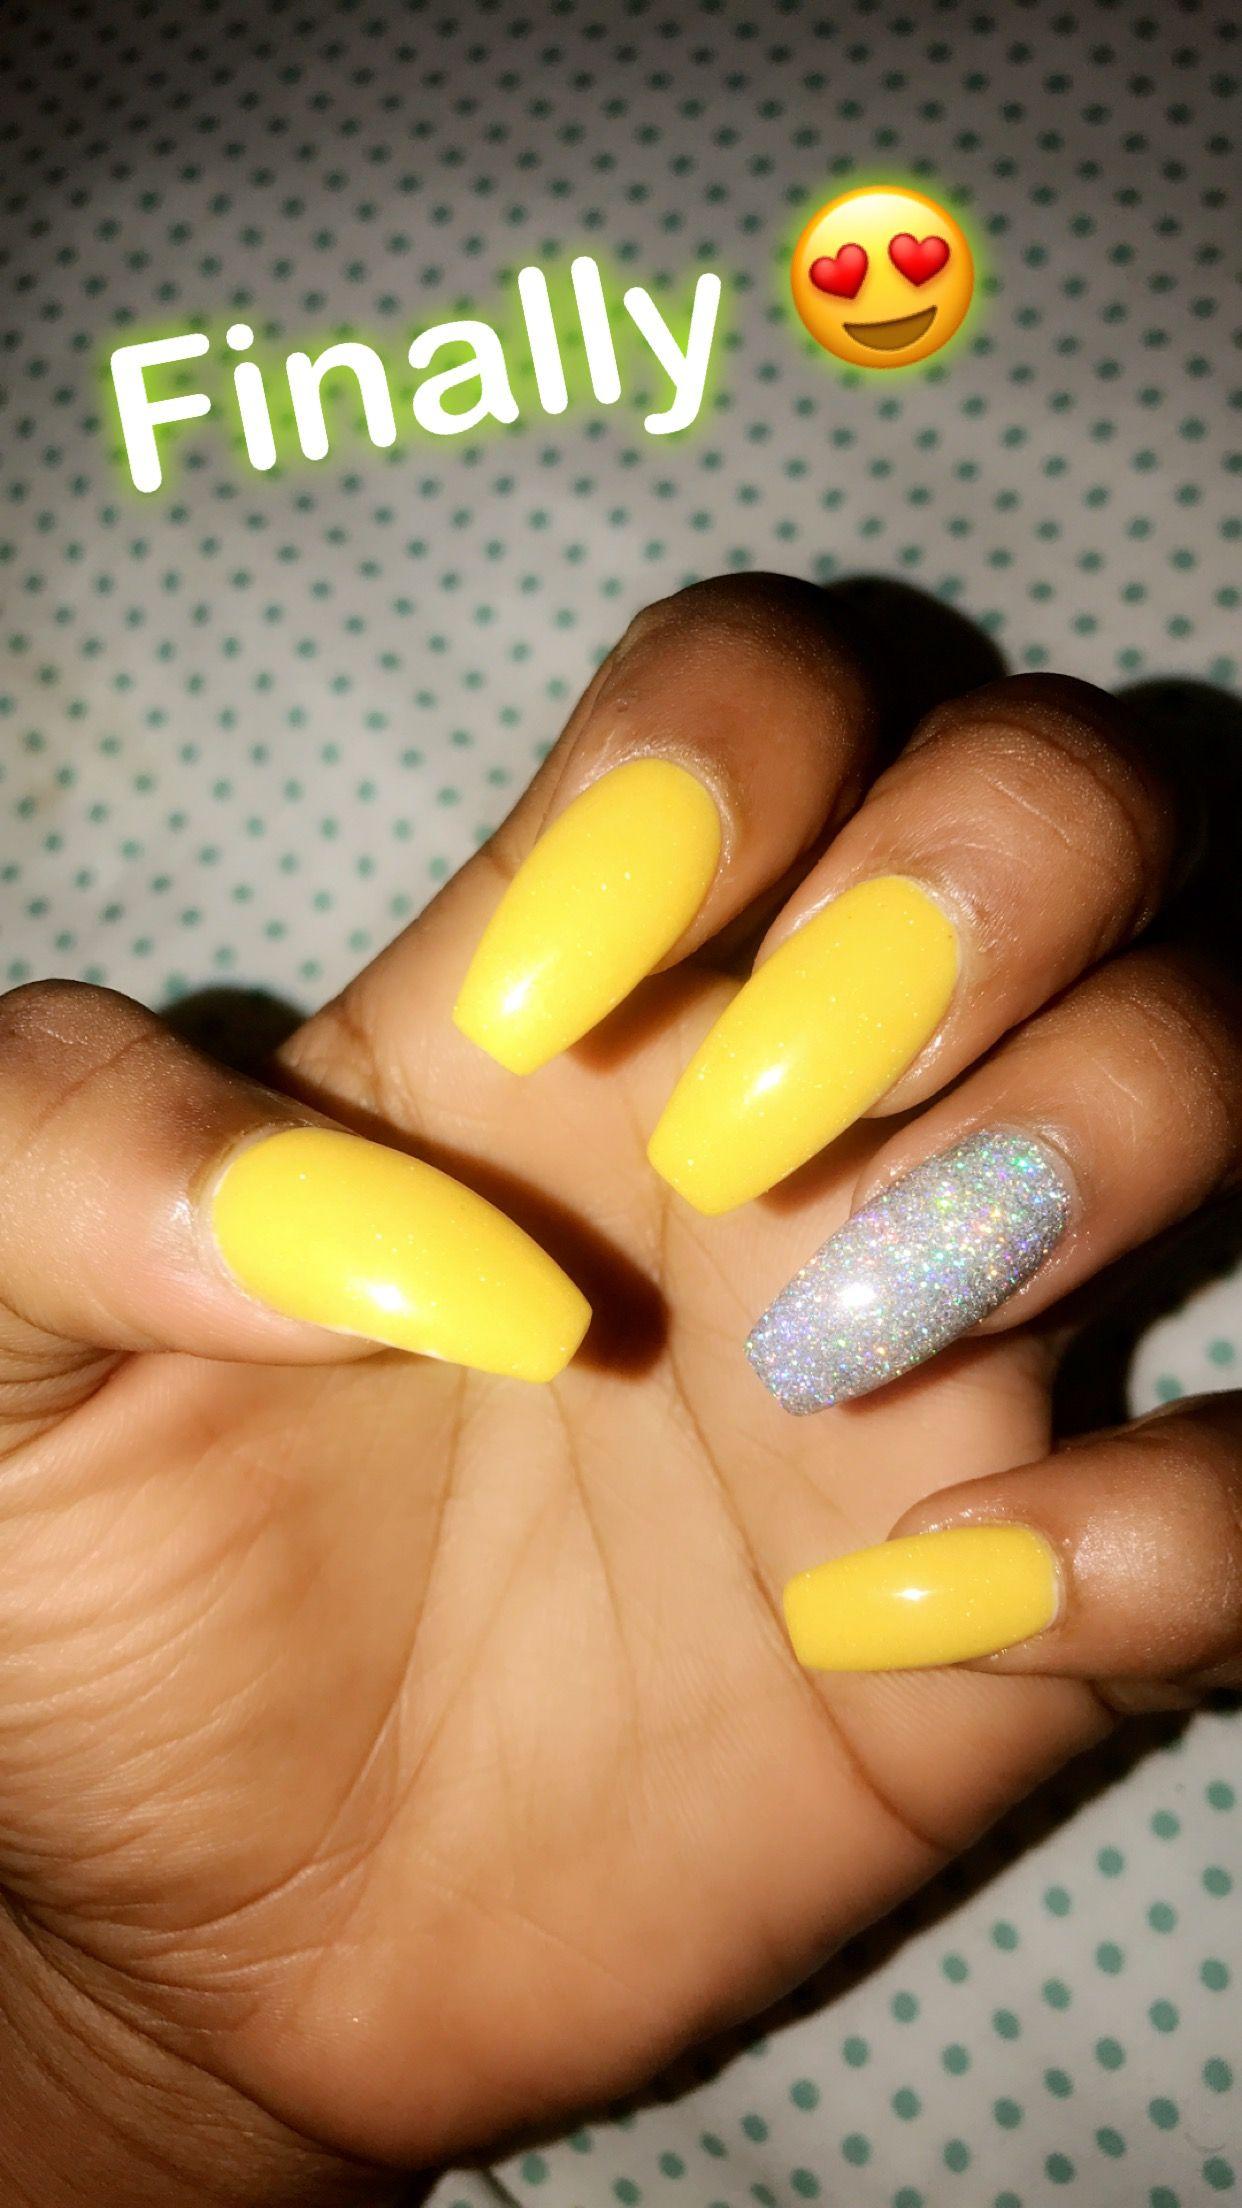 Pinterest Oddlyunique4 Acrylic Nails Yellow Best Acrylic Nails Square Acrylic Nails